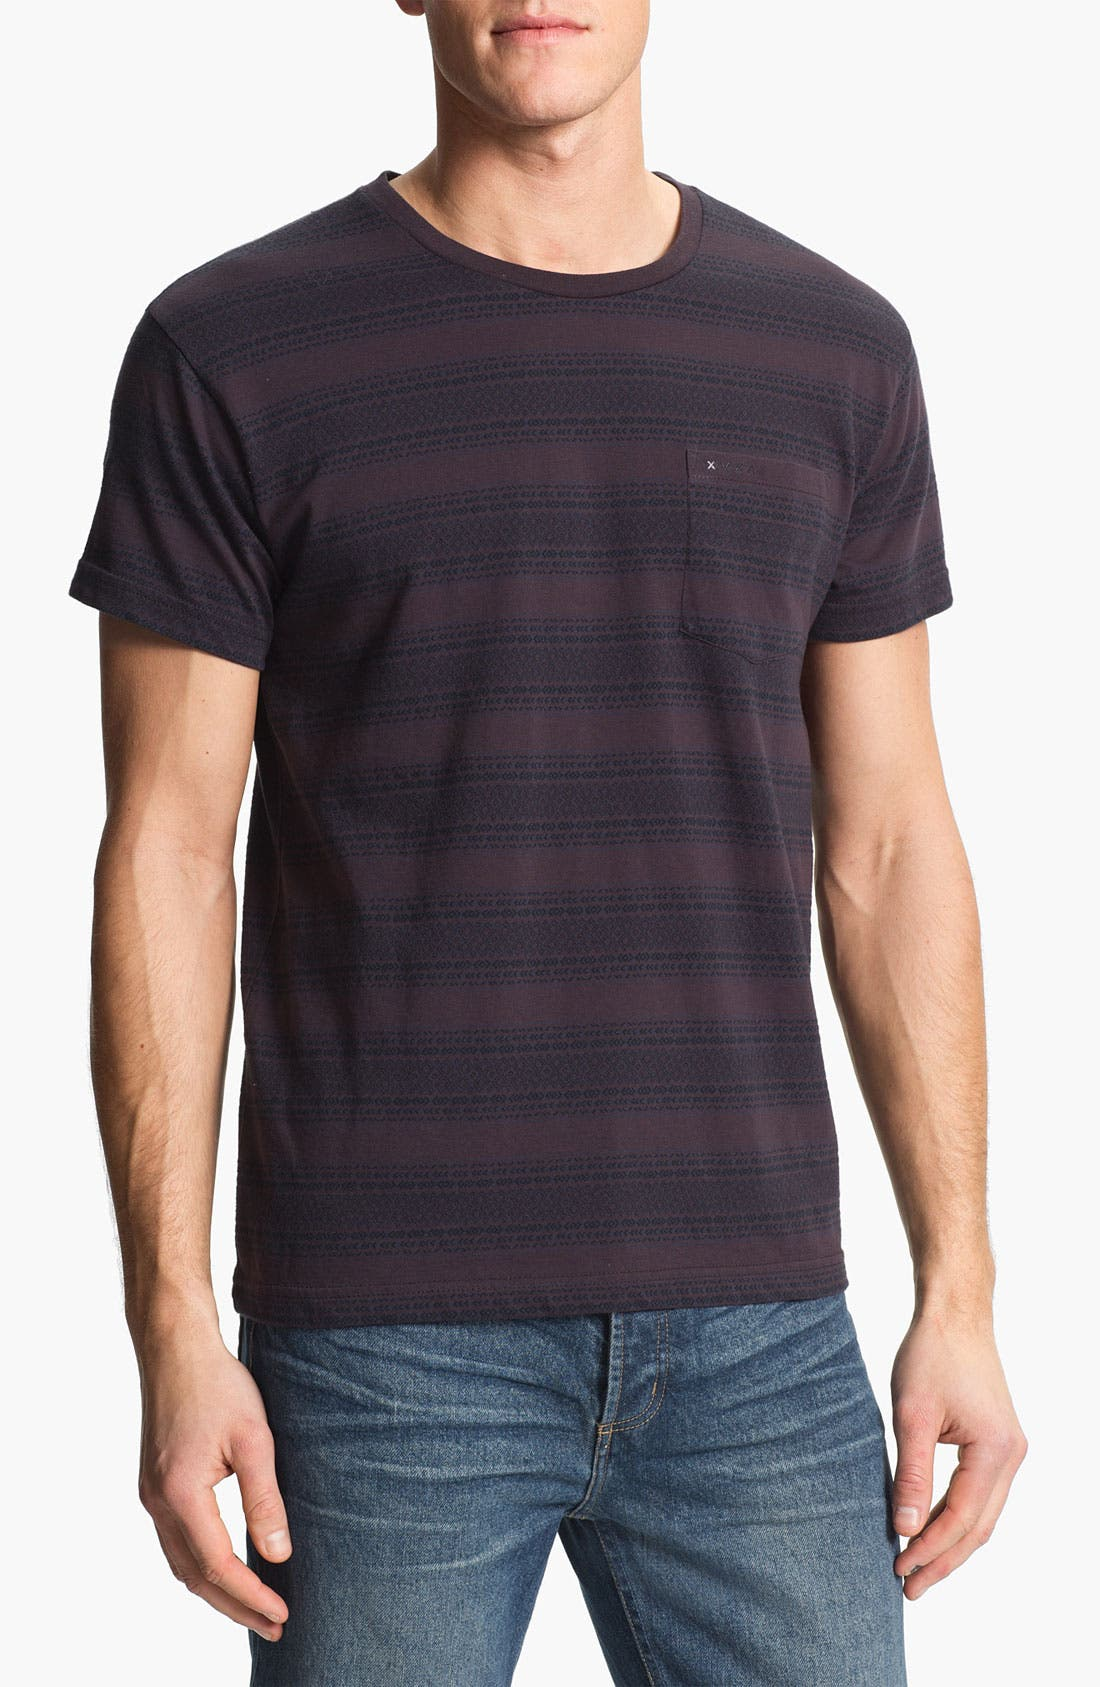 Alternate Image 1 Selected - RVCA 'Shaman' Stripe Crewneck T-Shirt